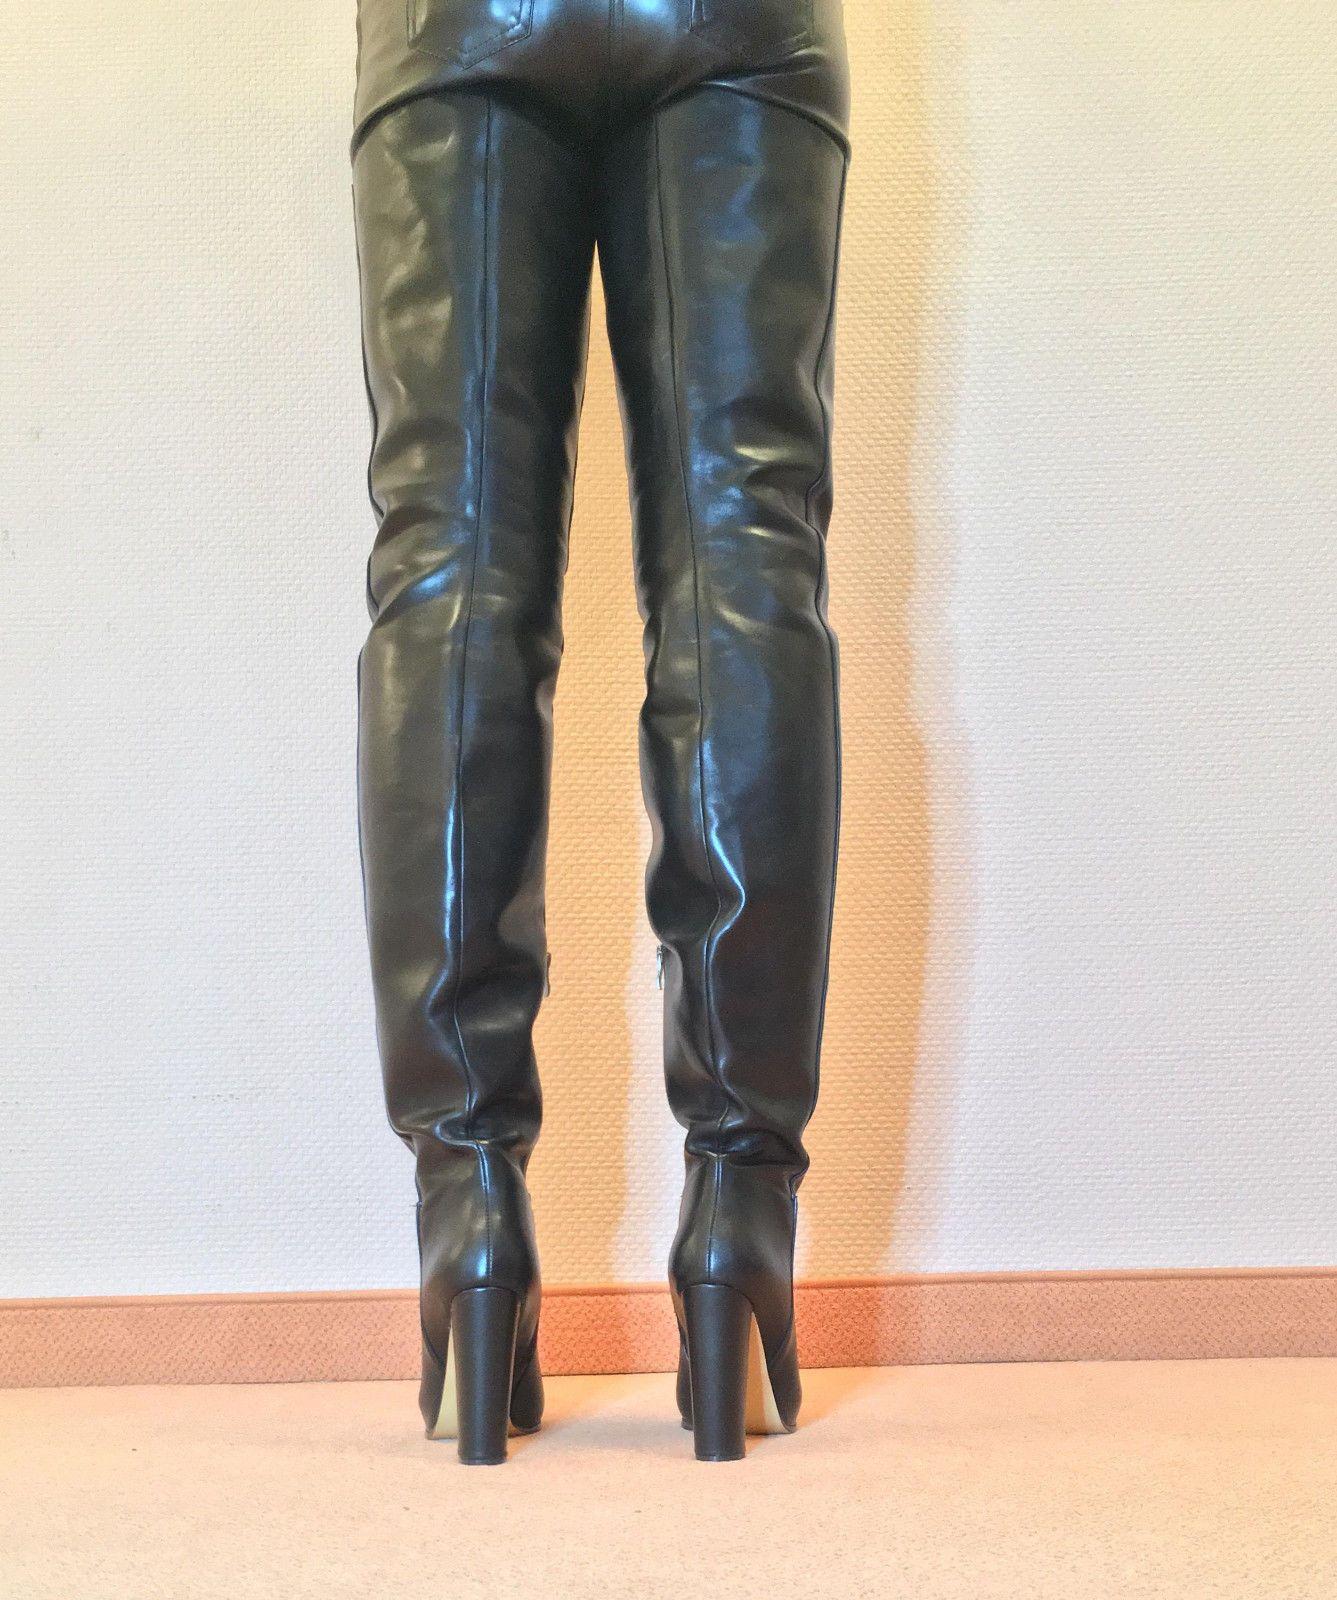 827245e24e25ce Gr.45 TOP! Exclusive Sexy Women s Shoes Over the Knee Boots Stiletto Boots  Men C6